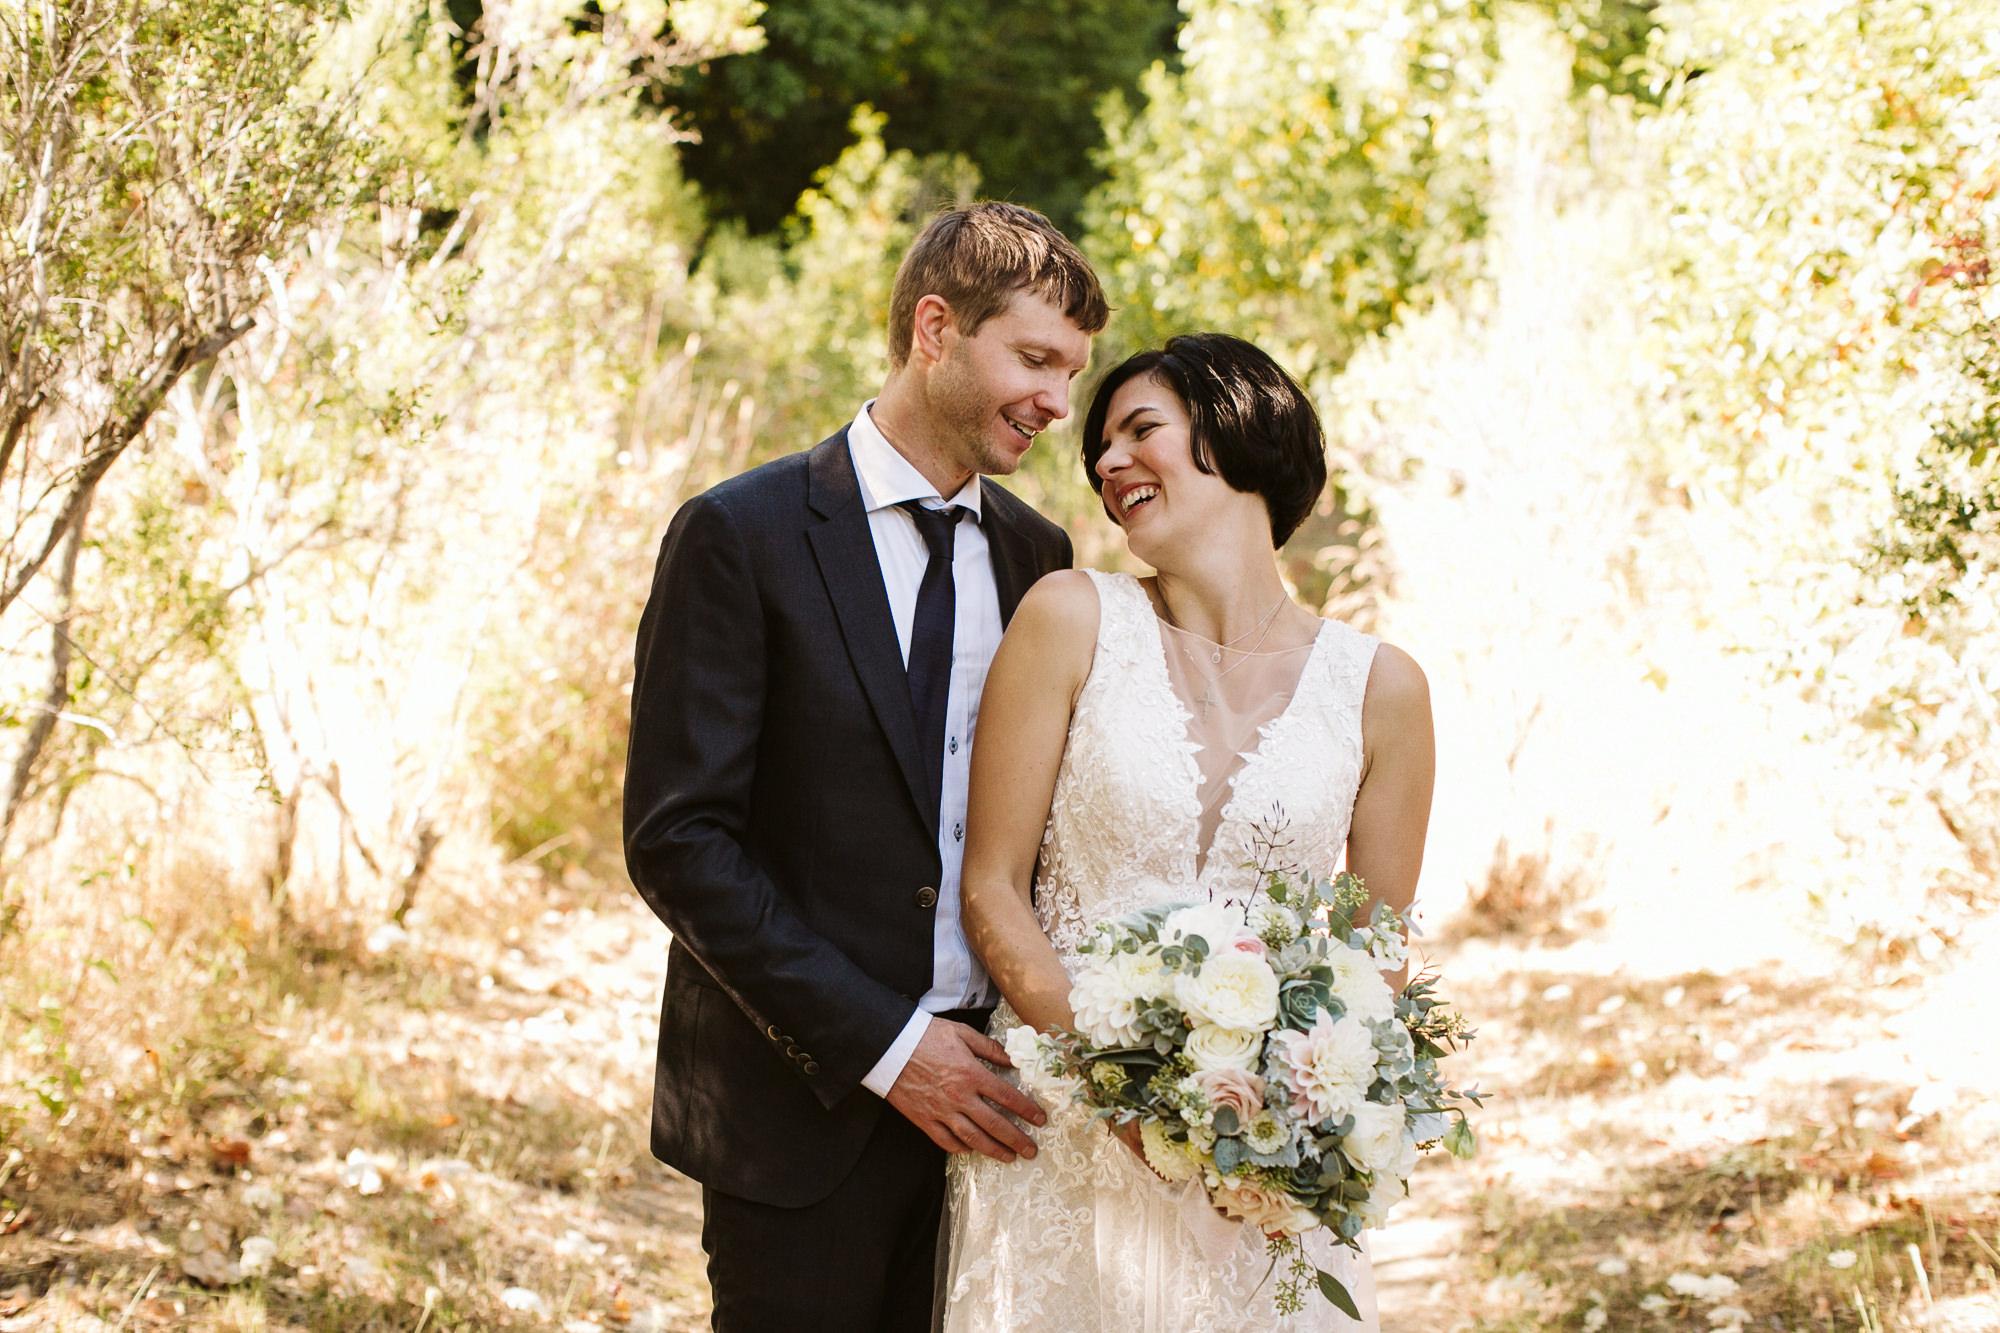 California-wedding-photographer-alfonso-flores-pamplin-groove-270.jpg